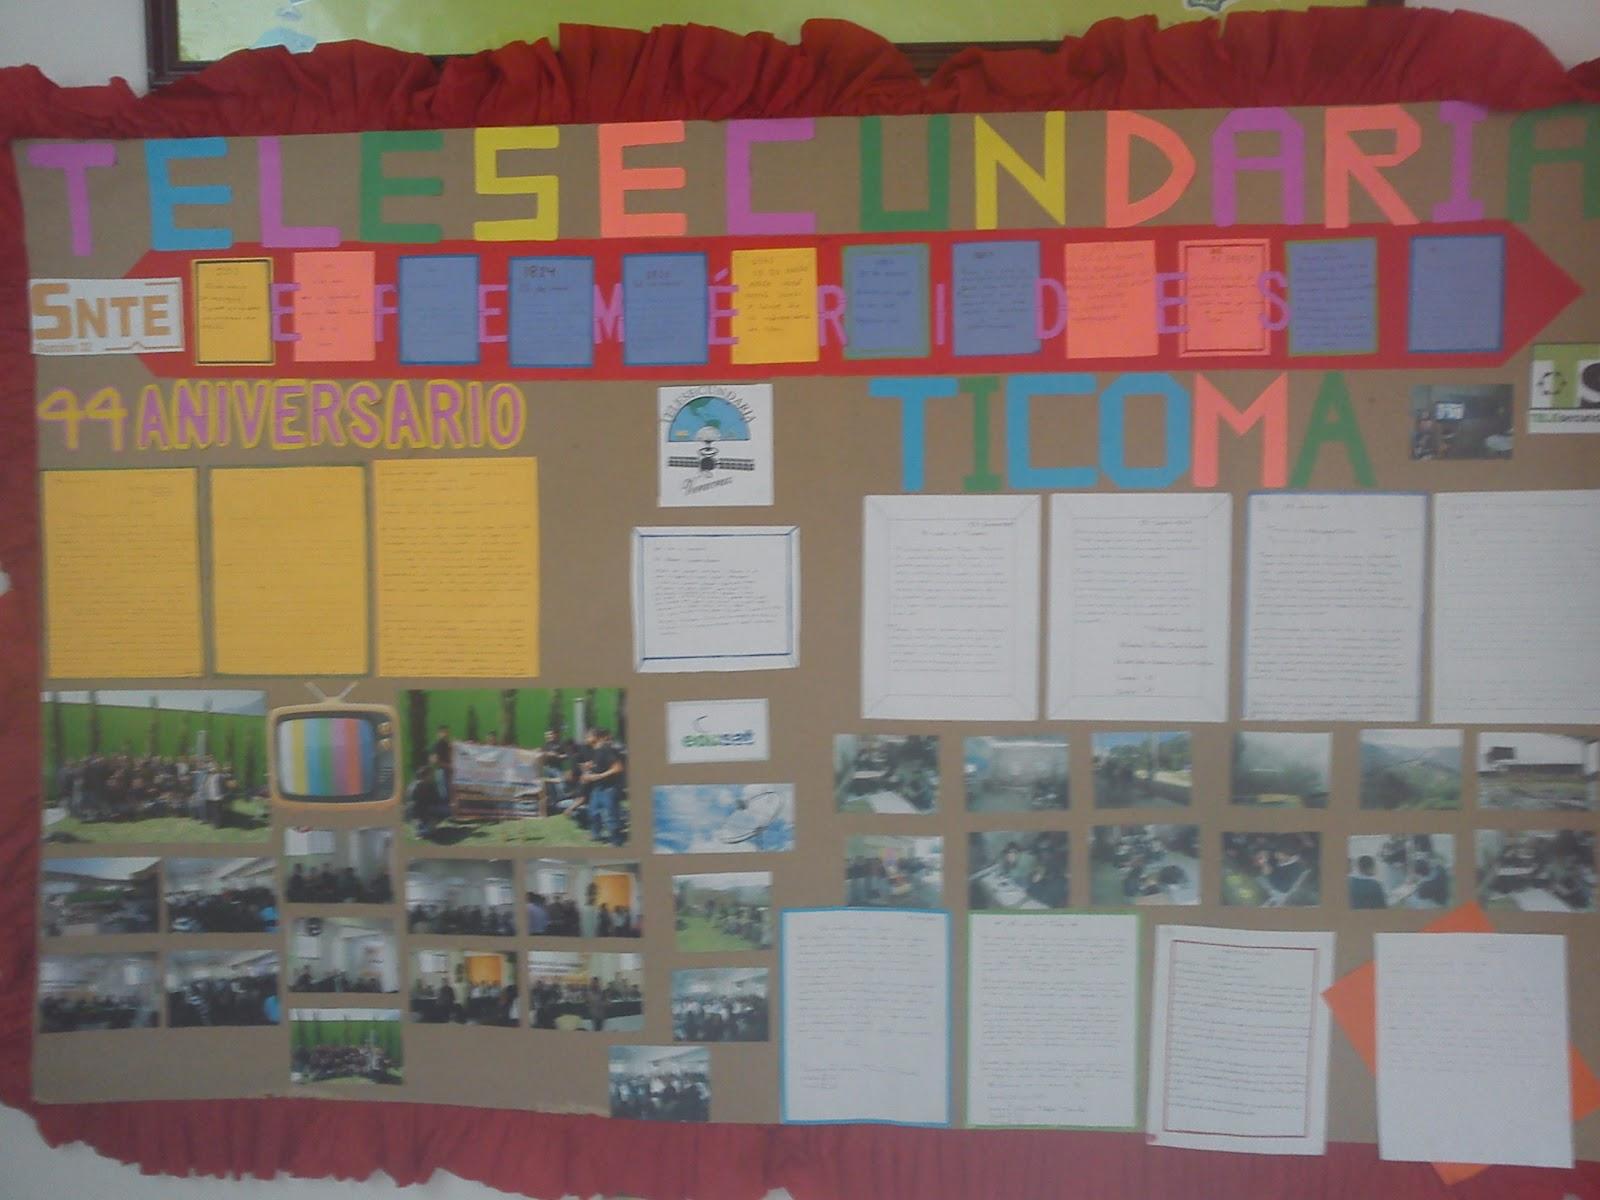 Supervisi n escolar zona 83 zongolica periodico mural for El mural periodico